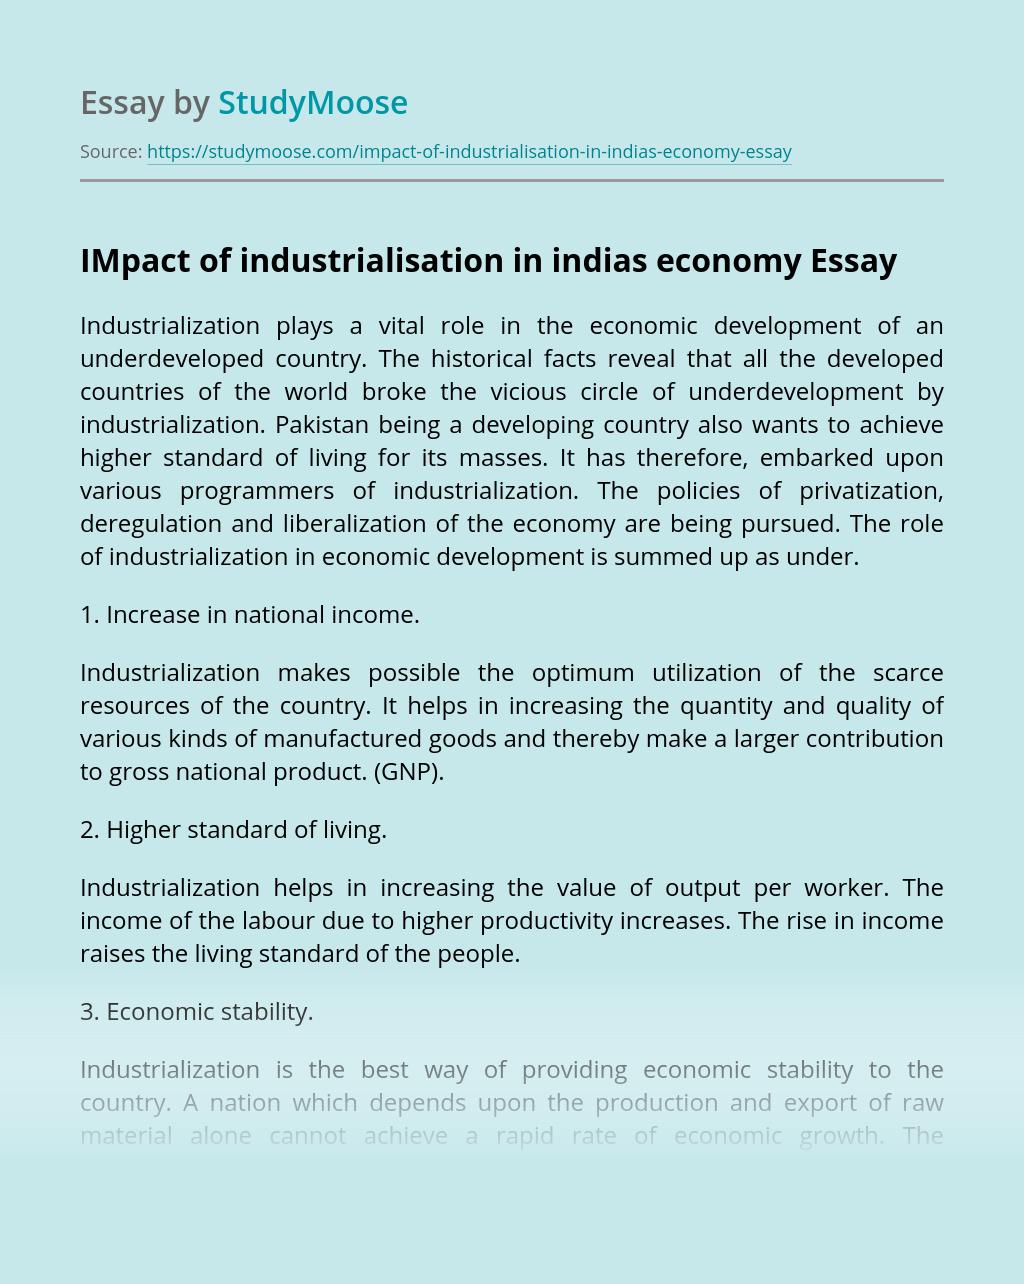 IMpact of industrialisation in indias economy